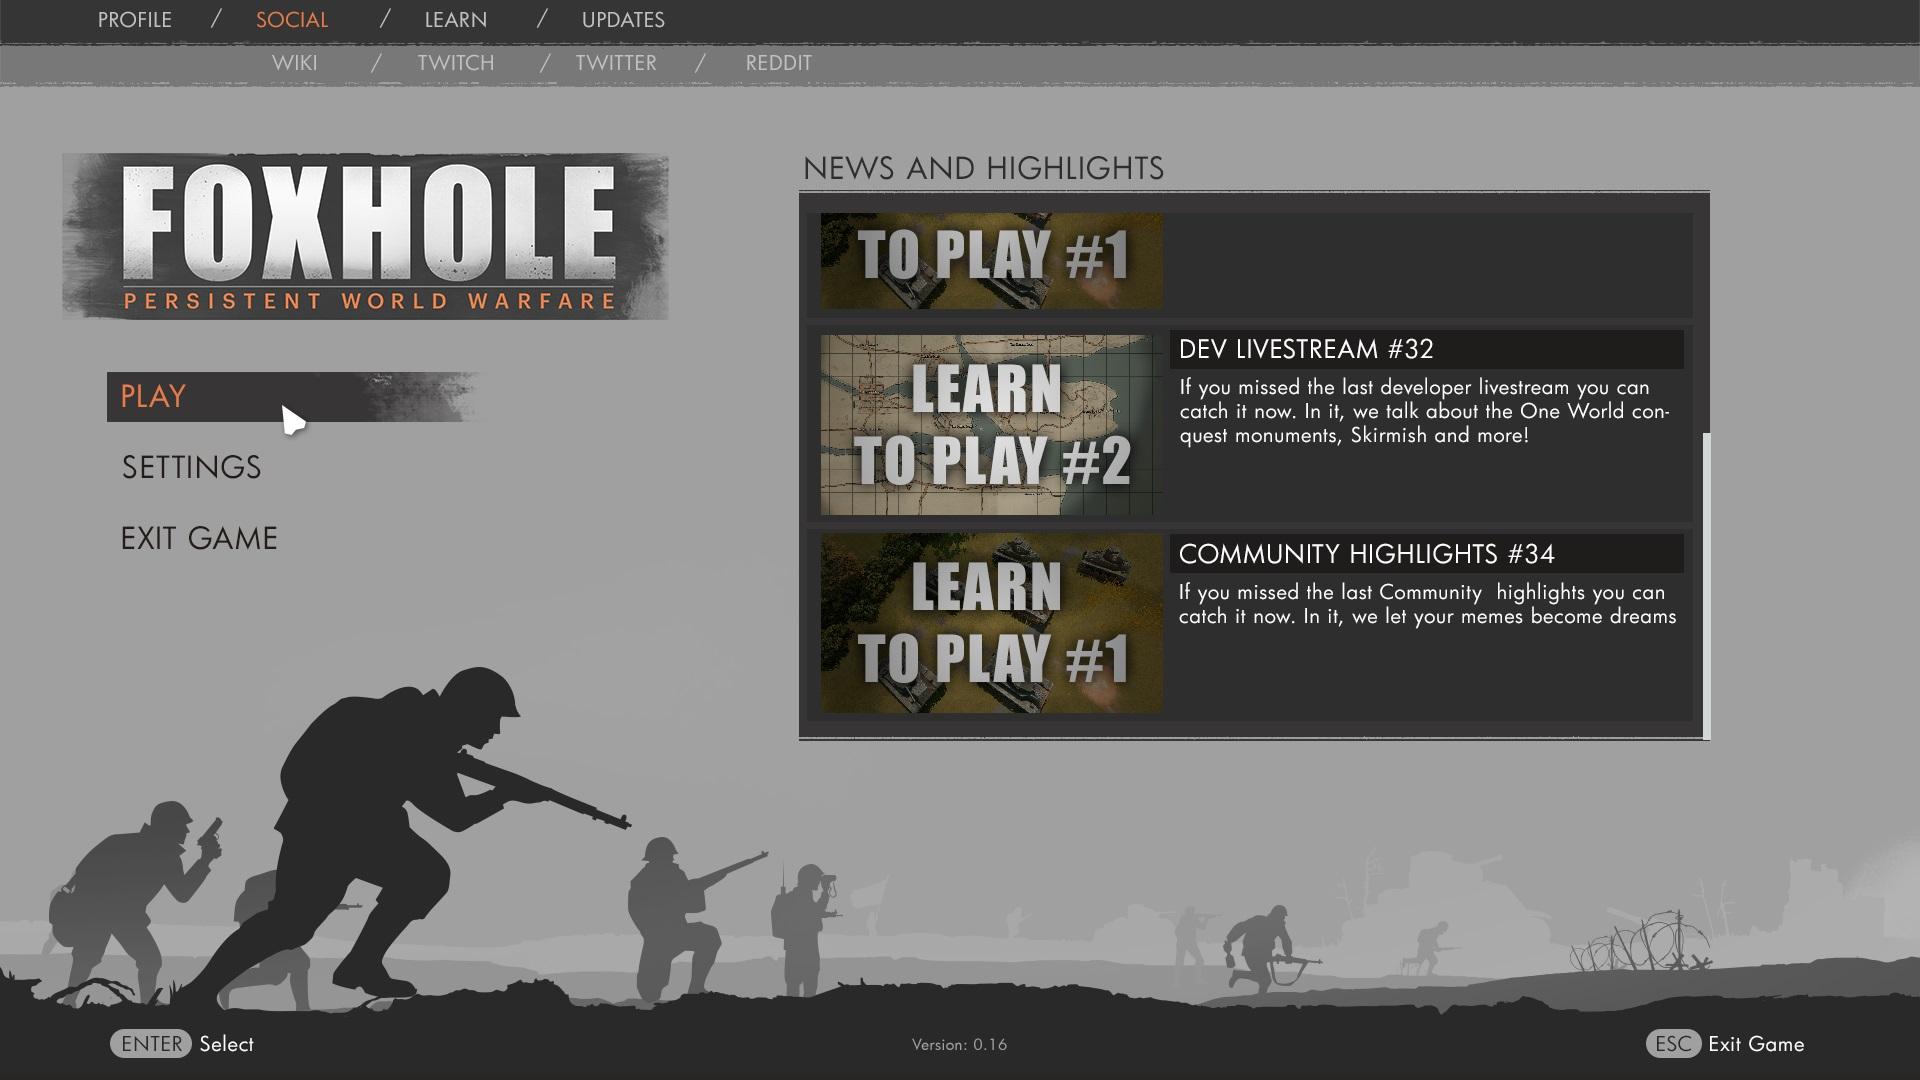 Storage Facility & UI design explorations news - Foxhole